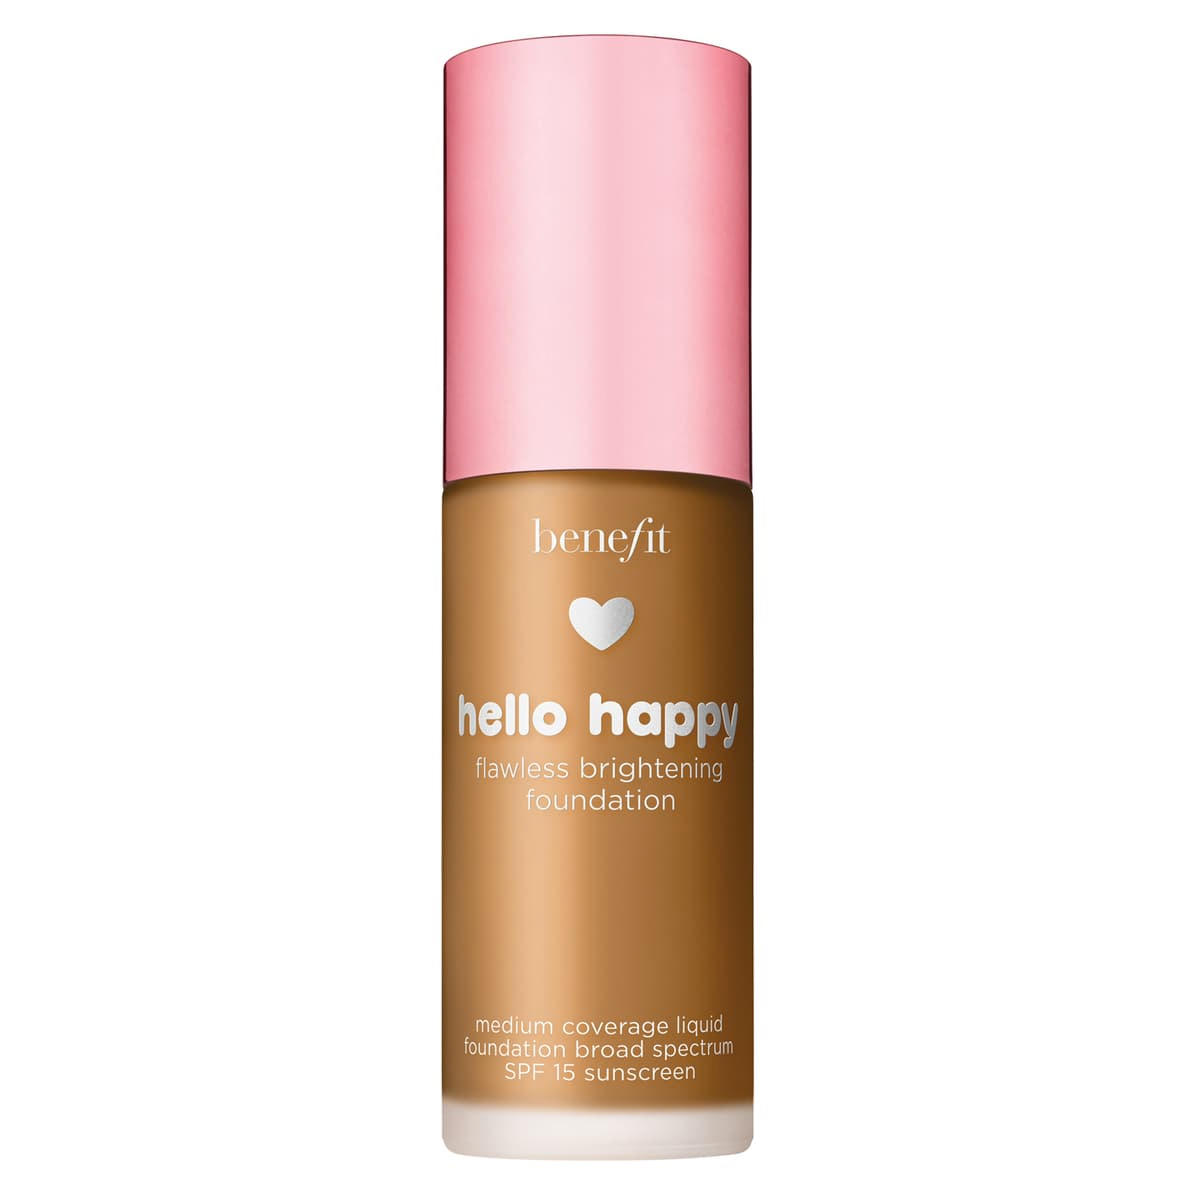 Benefit Hello Happy Flawless Brightening Foundation 7